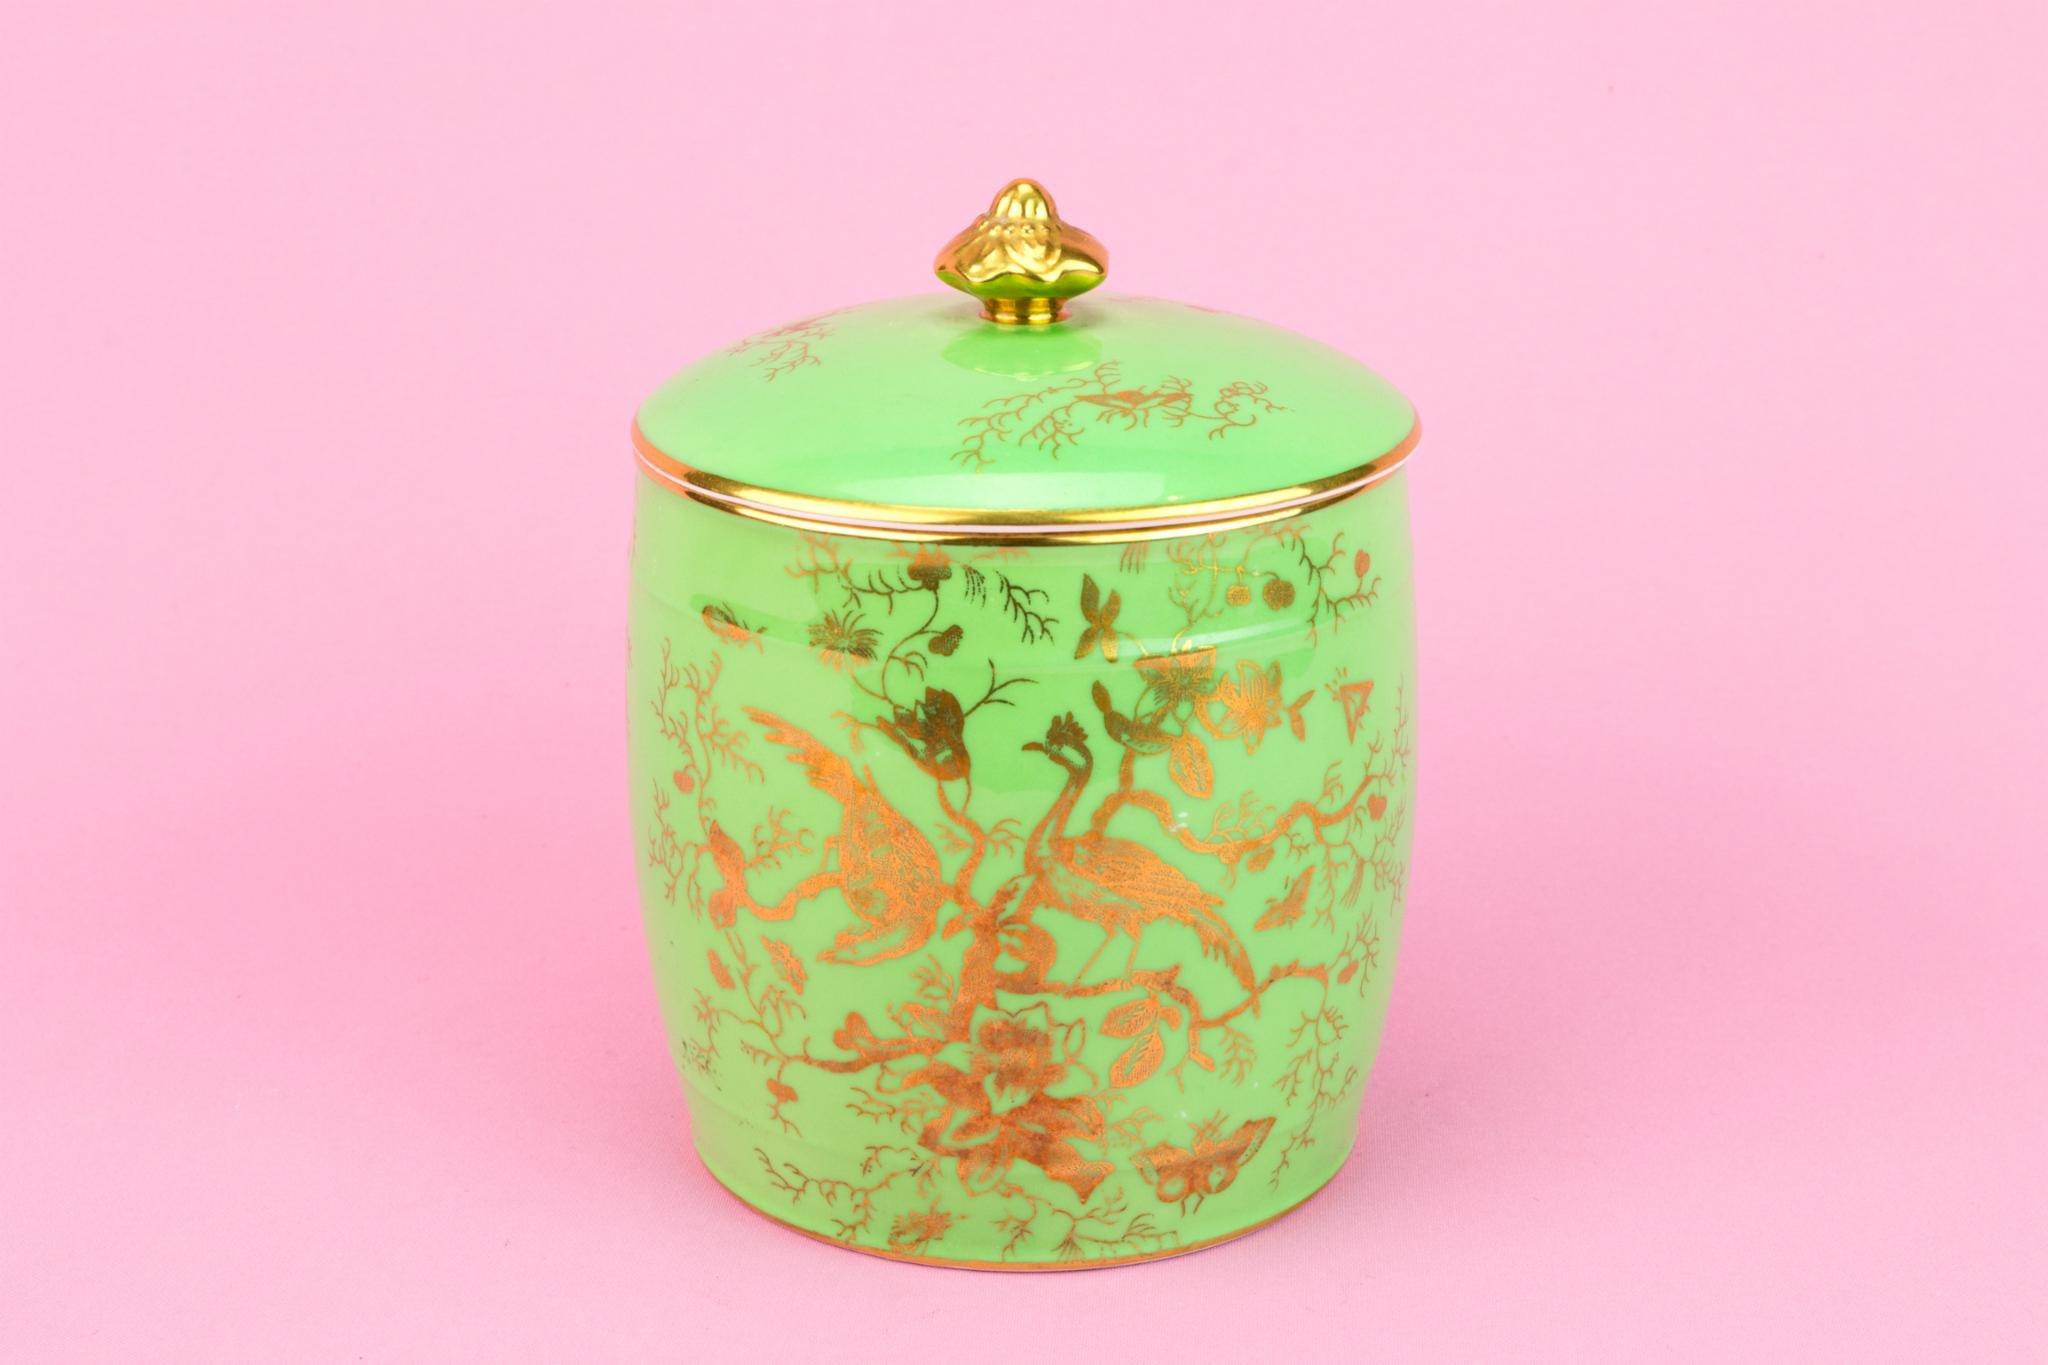 Green Coalport Bone China Kitchen Jar Lid Gilded Medium Barrel Shape Traditional English Mid 20th Century